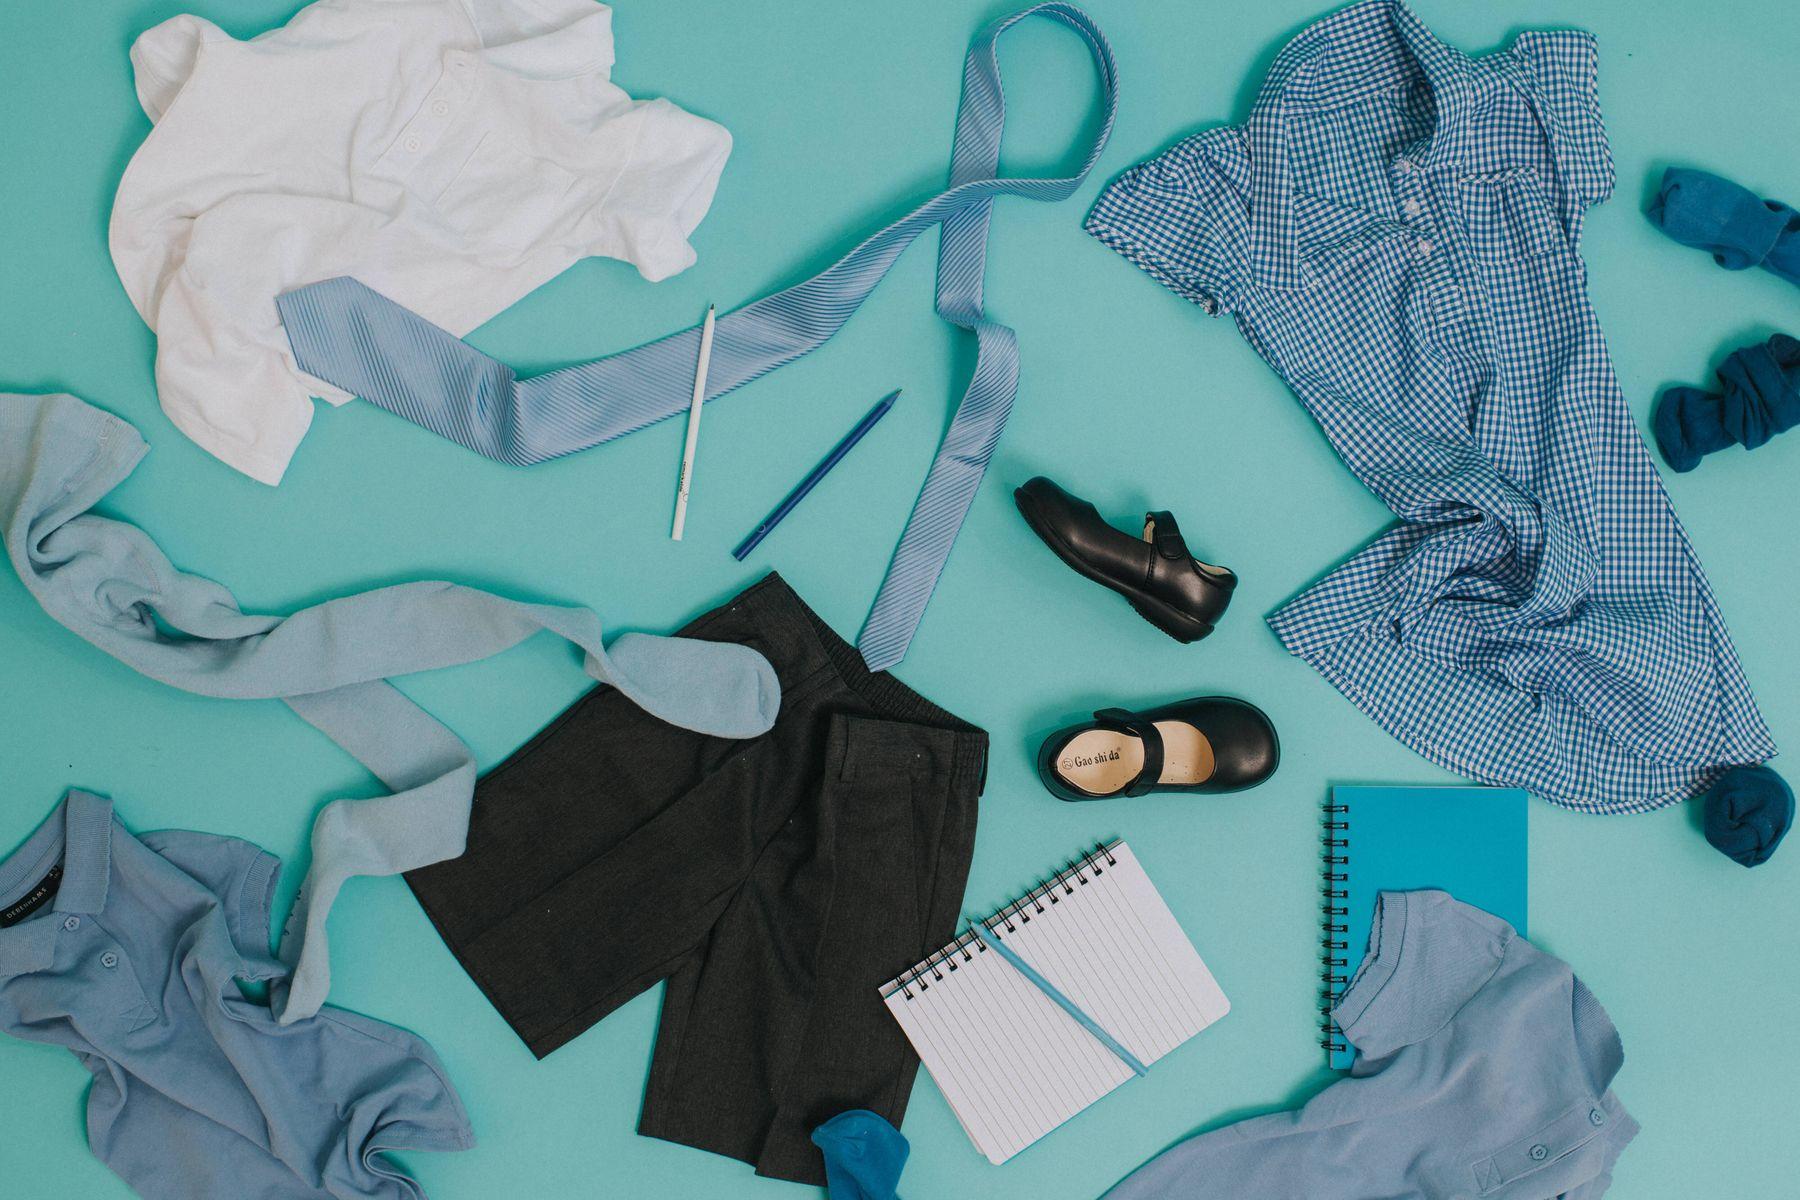 How to clean school uniforms